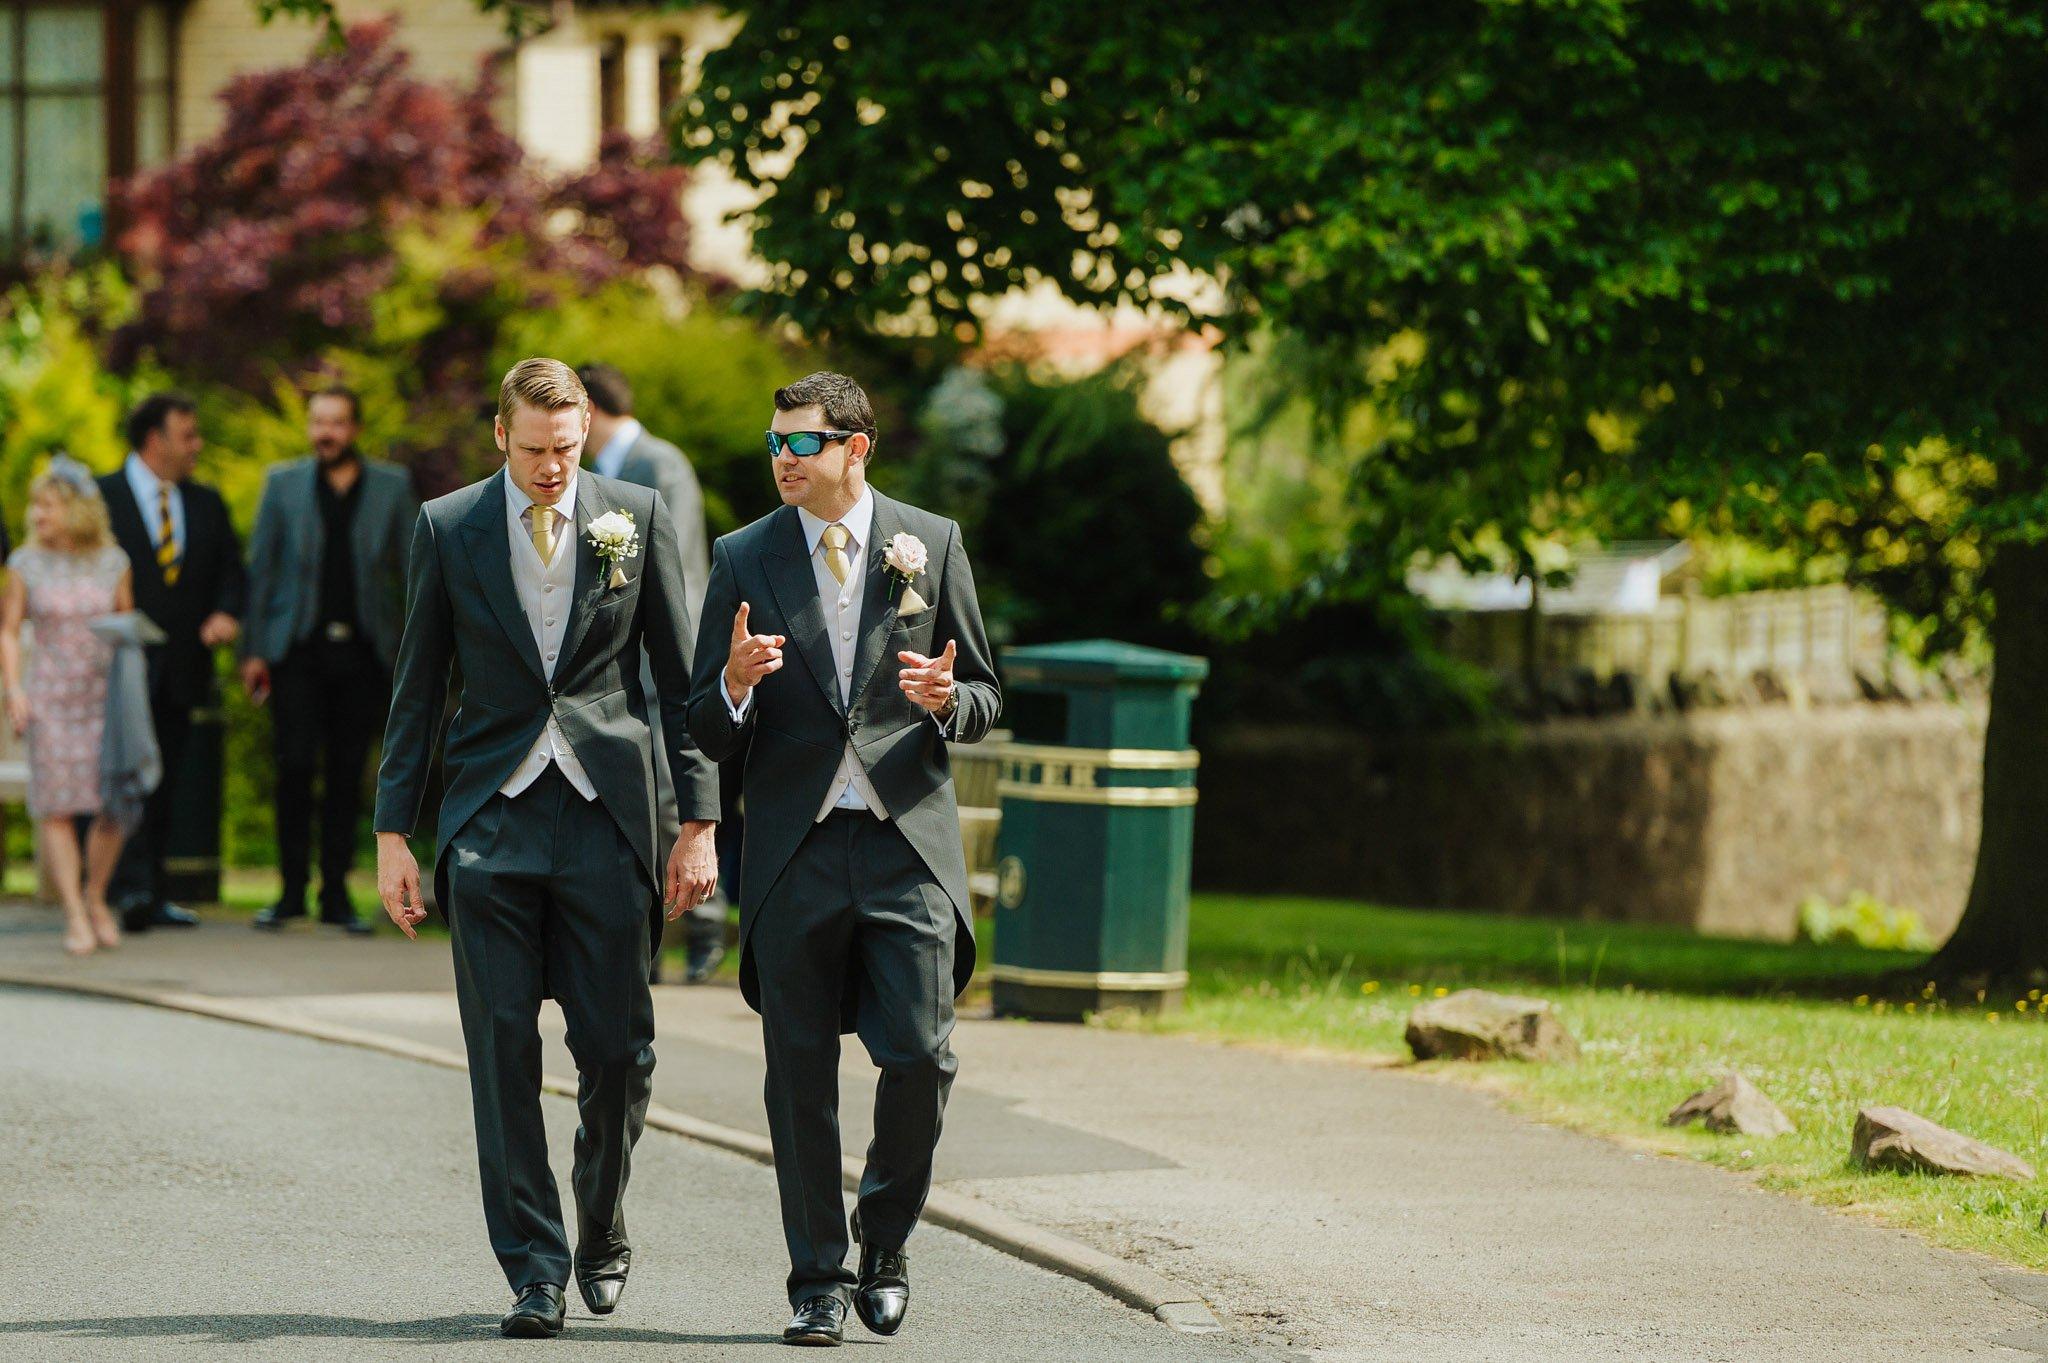 Georgina + Mike - Wedding photography in Malvern, Worcestershire 15